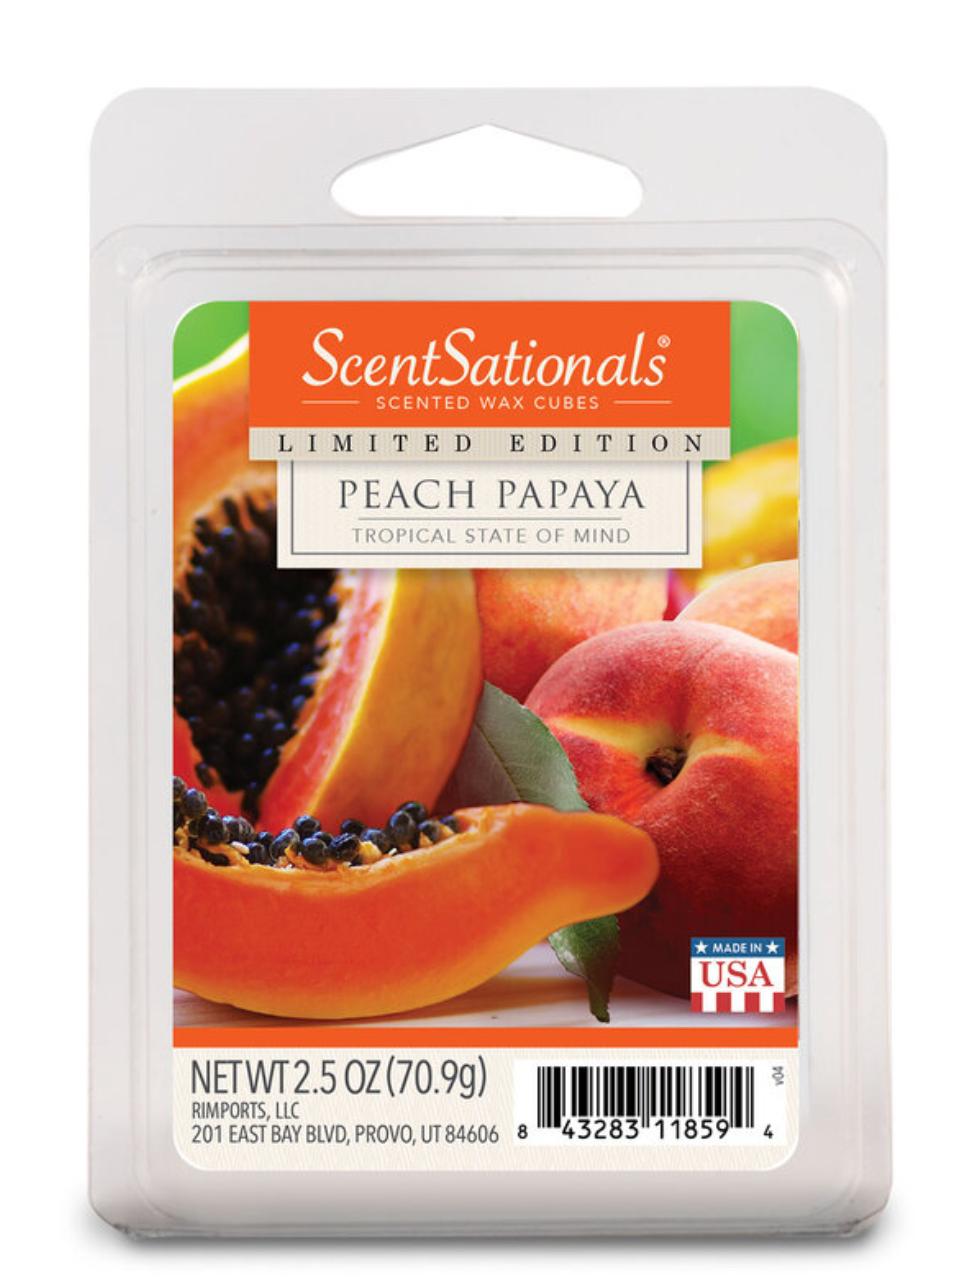 ScentSationals Scented Wax Cubes, Peach Papaya, 2.5 Oz - $4.49